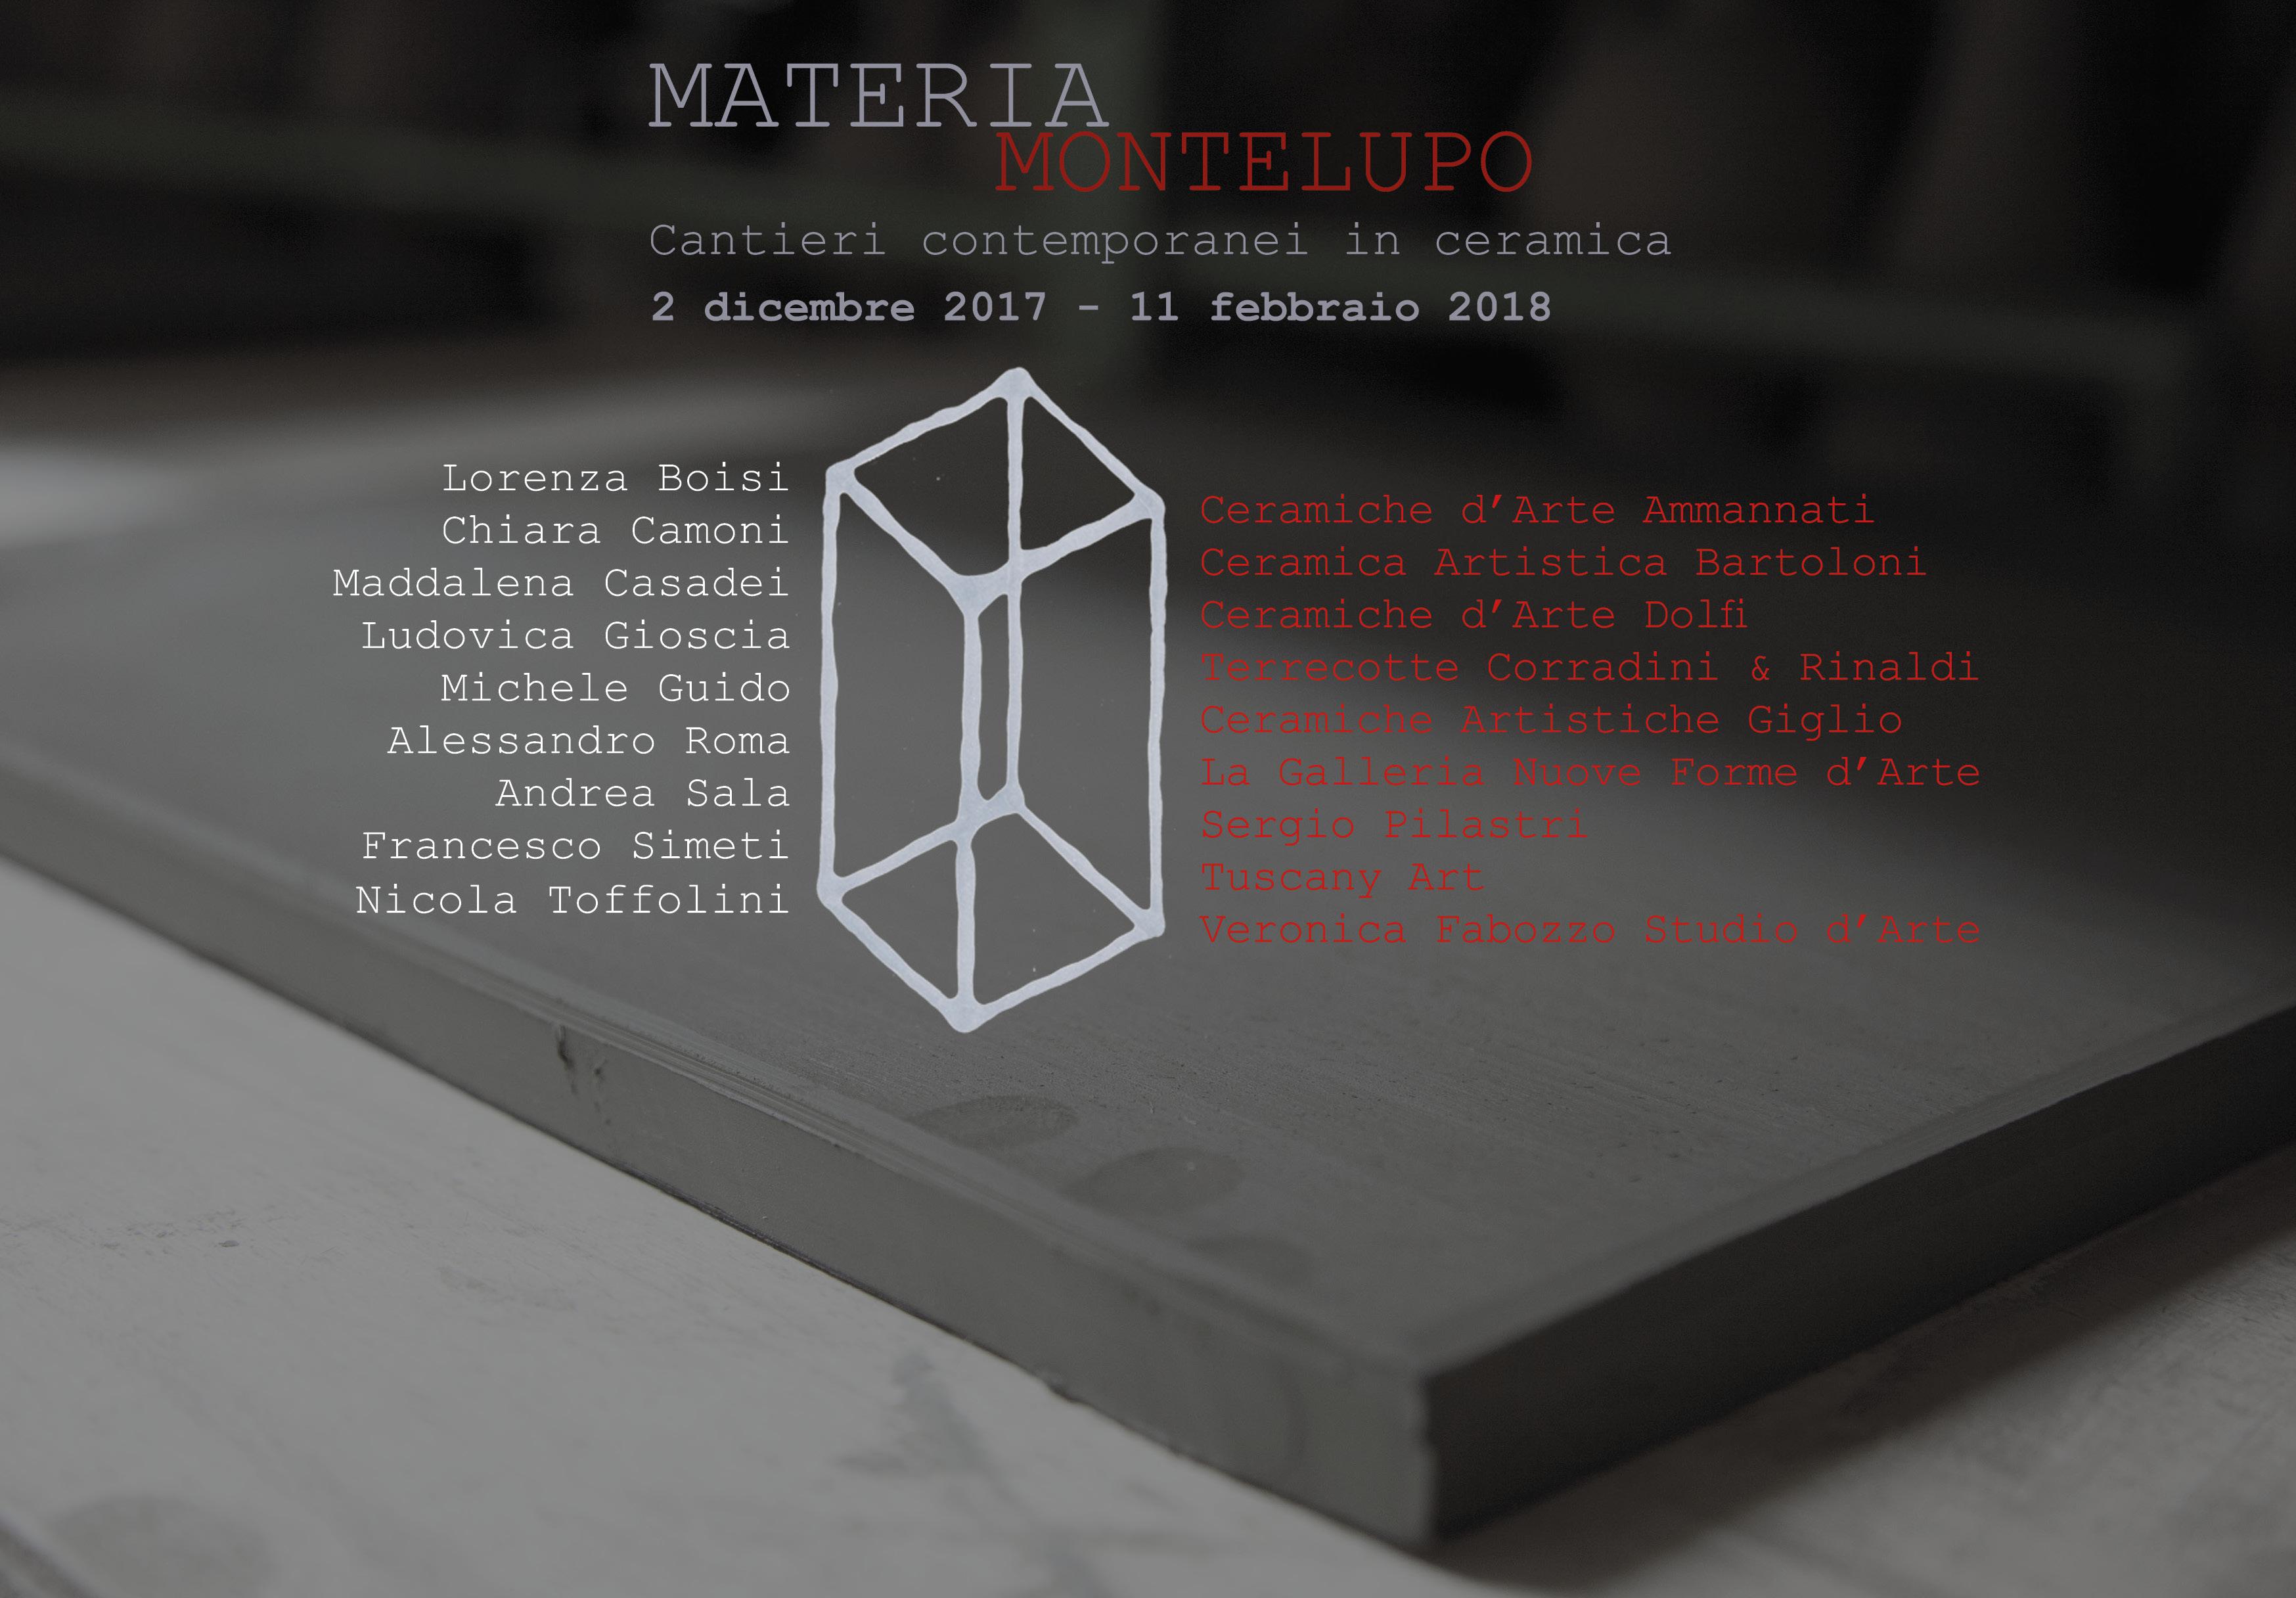 Materia Montelupo 2017, the exhibition of contemporary ceramic